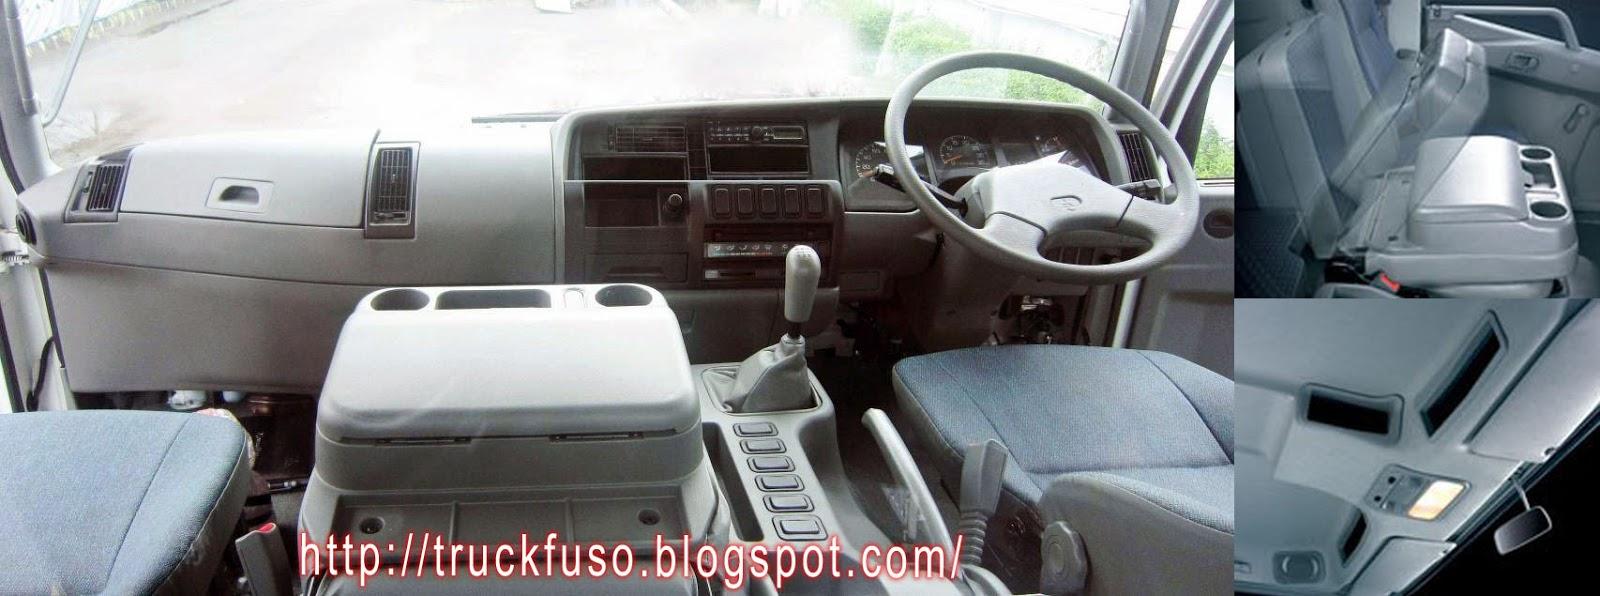 Harga Mitsubishi Pajero Sport - Dealer Mitsubishi Bandung